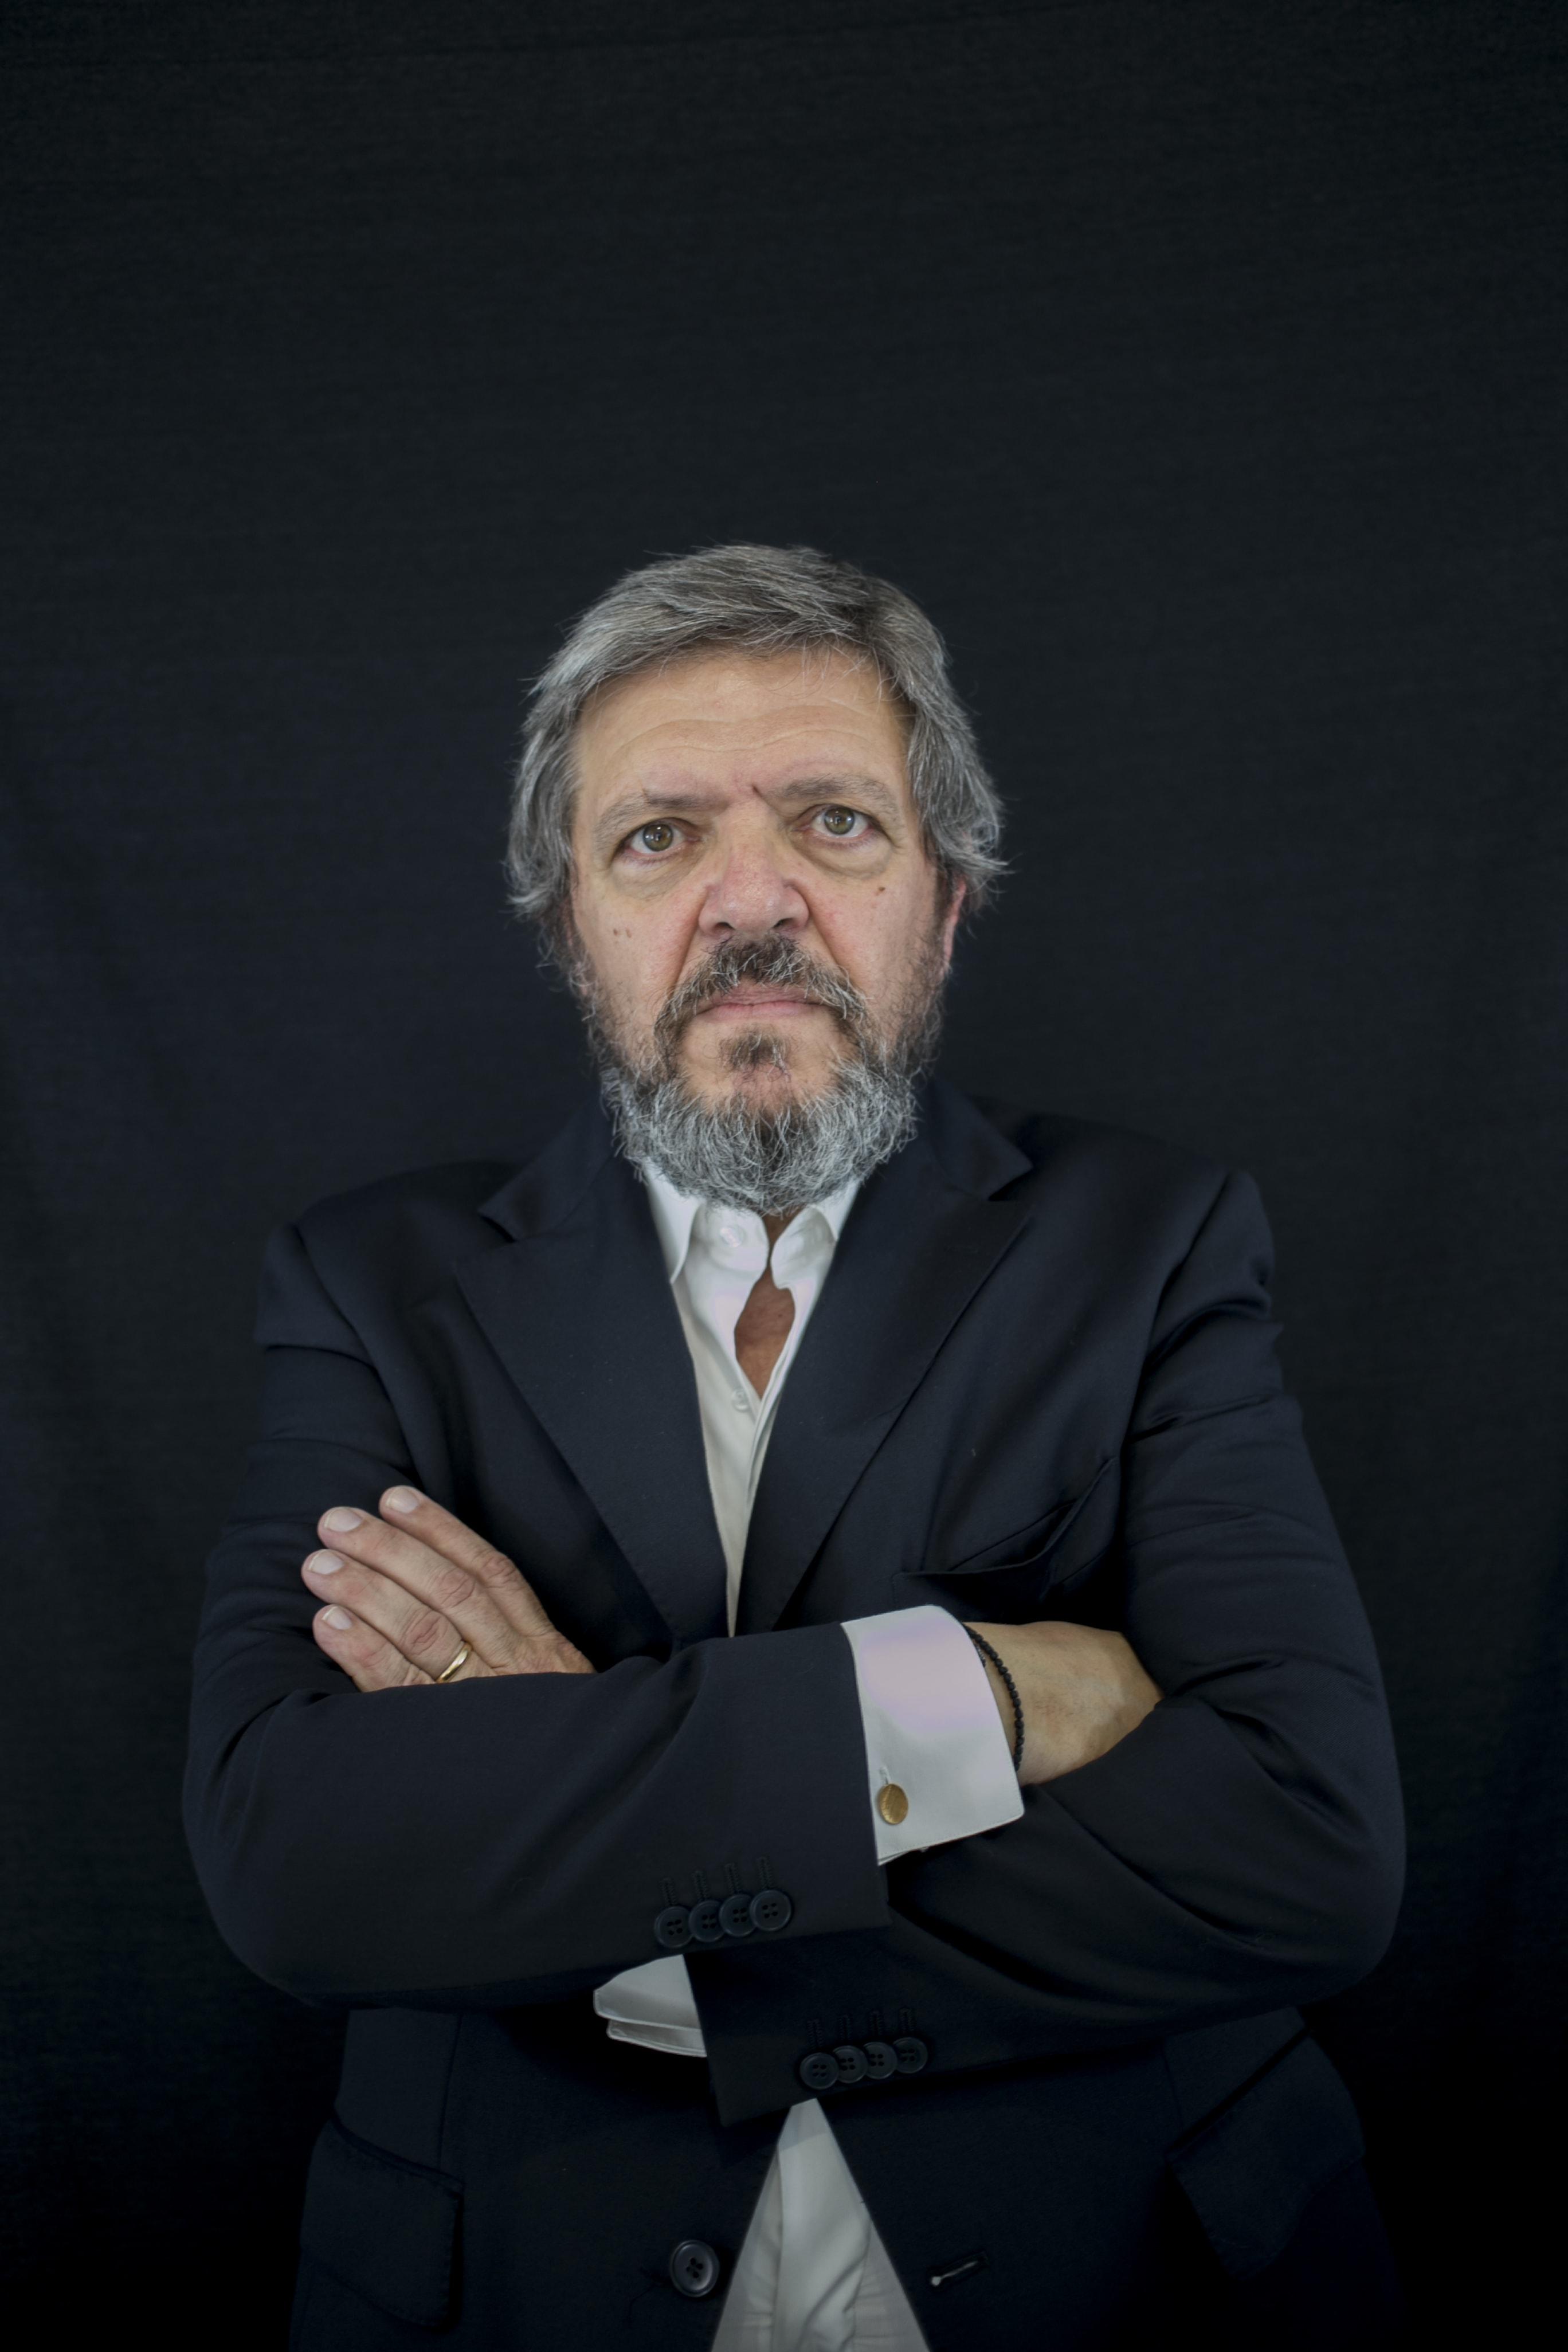 CARMELO GIORDANO